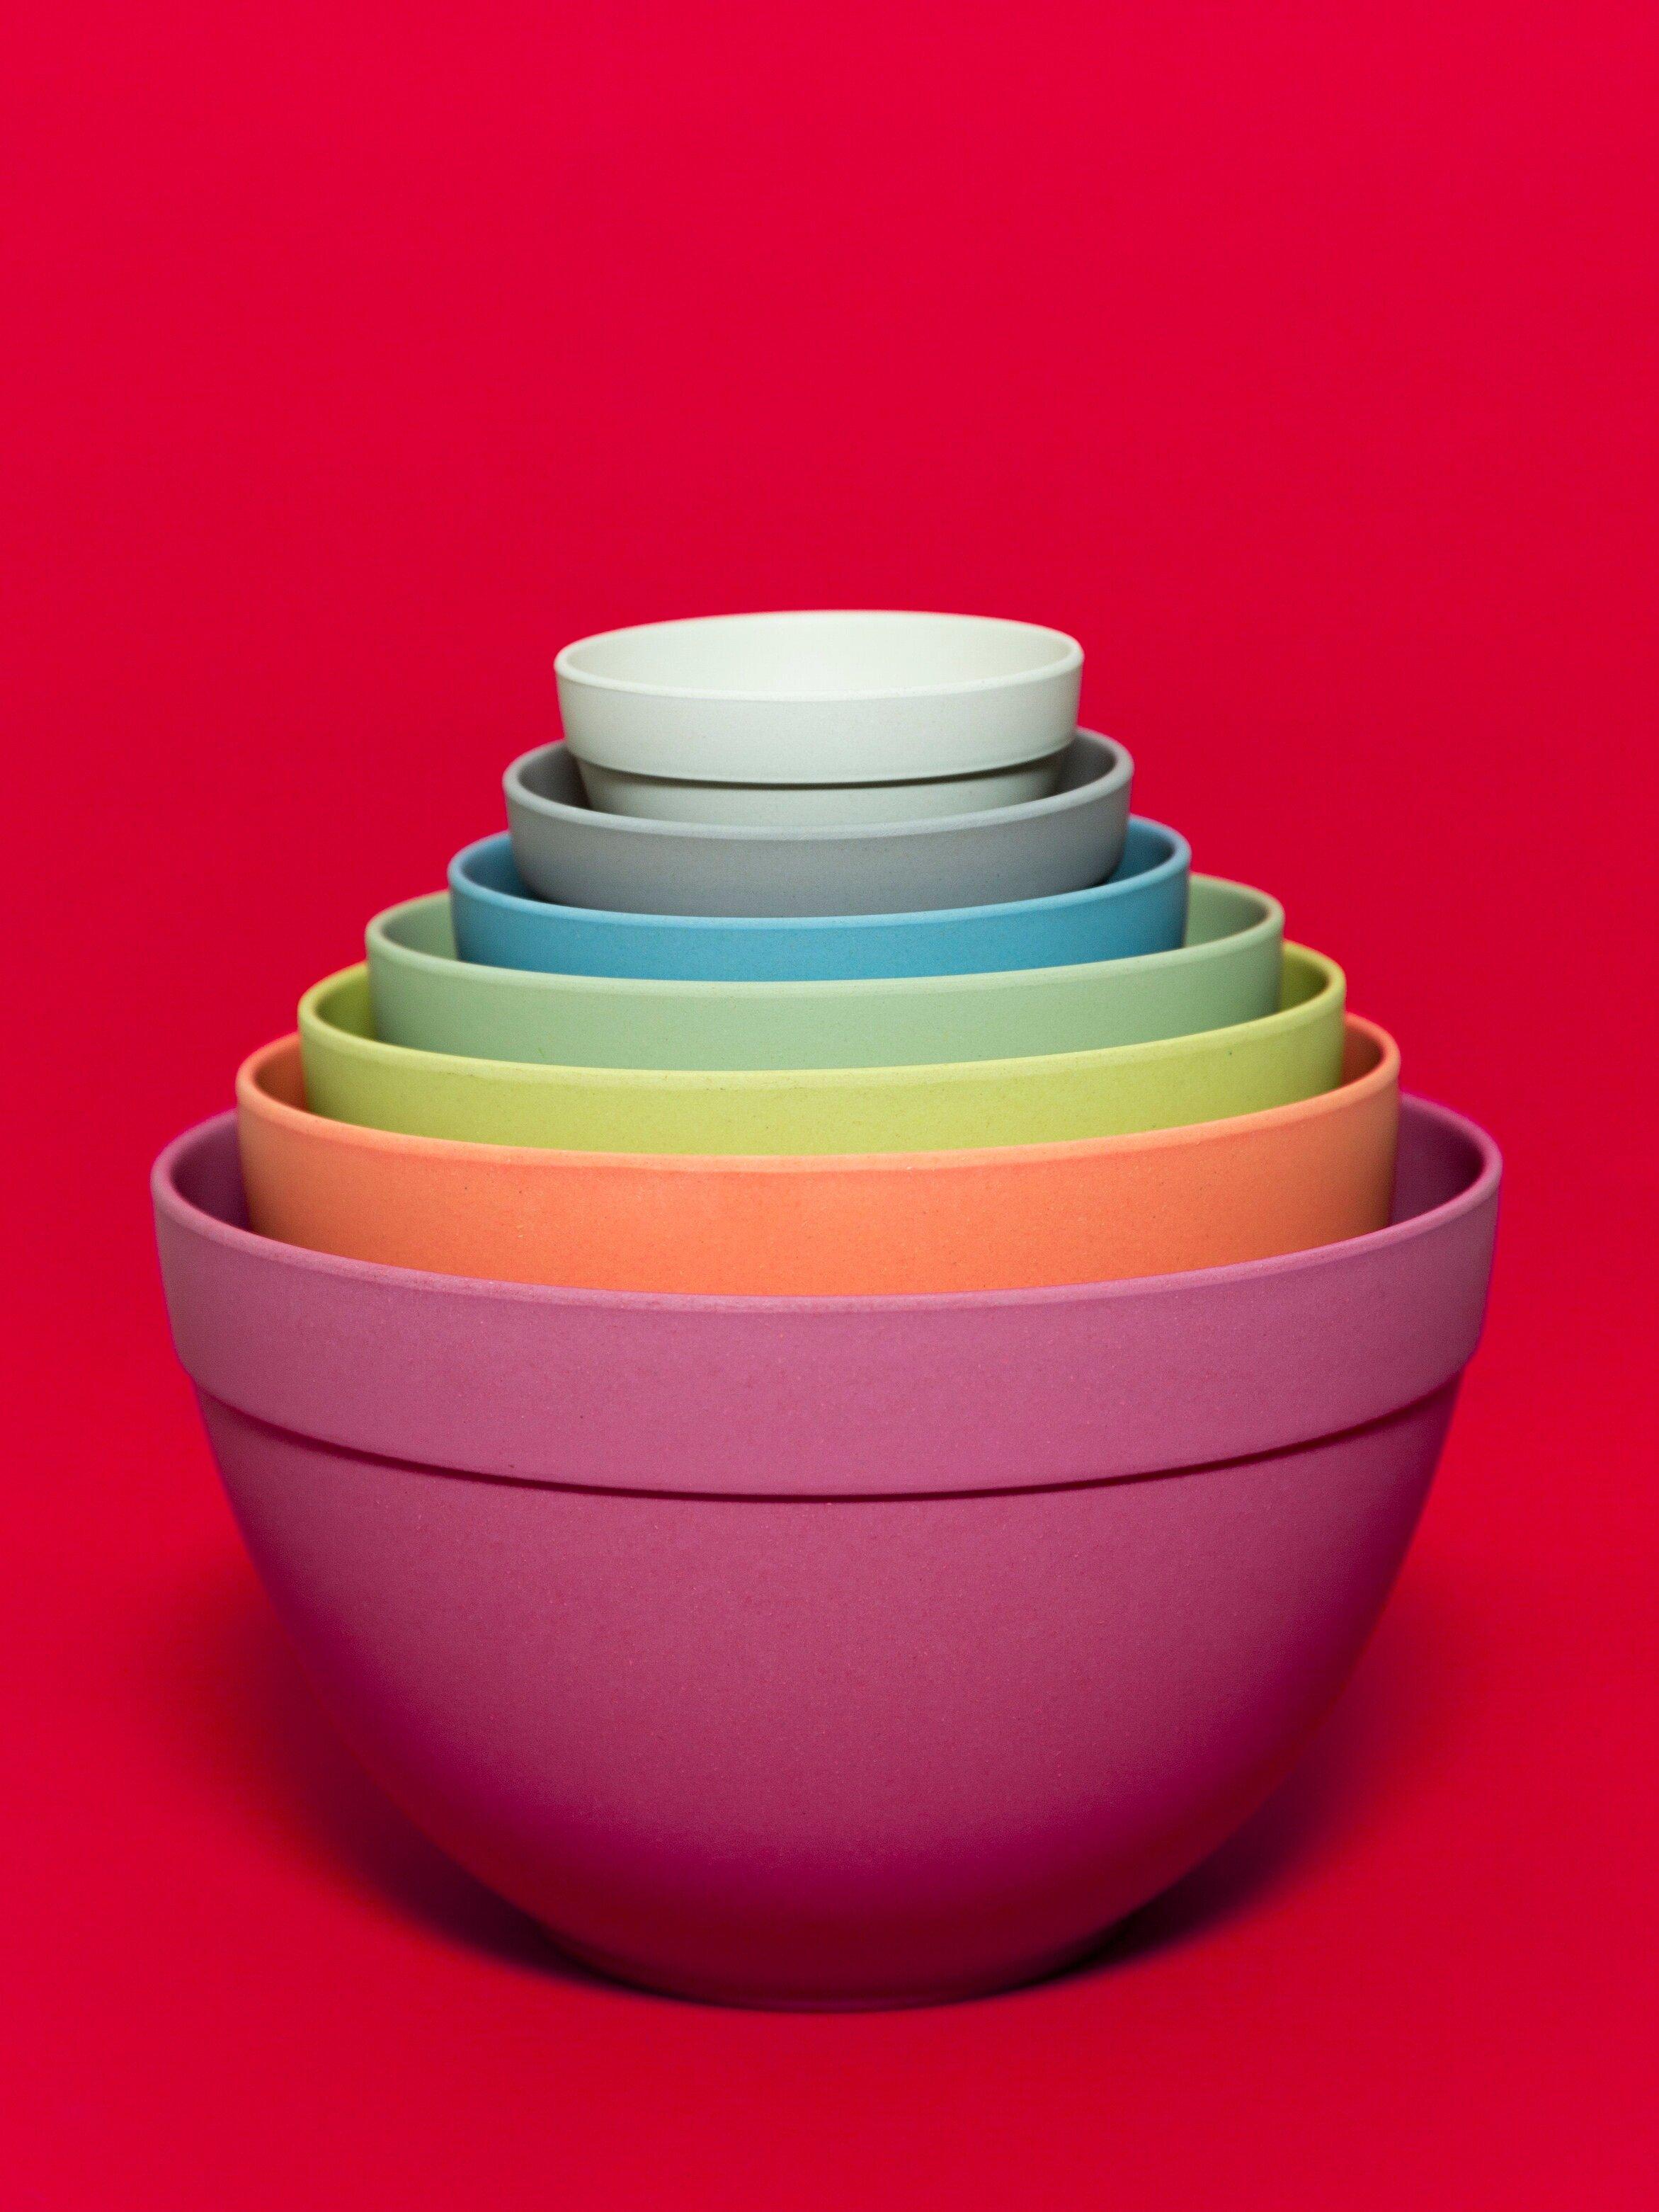 Baking Tools: Mixing Bowl Set